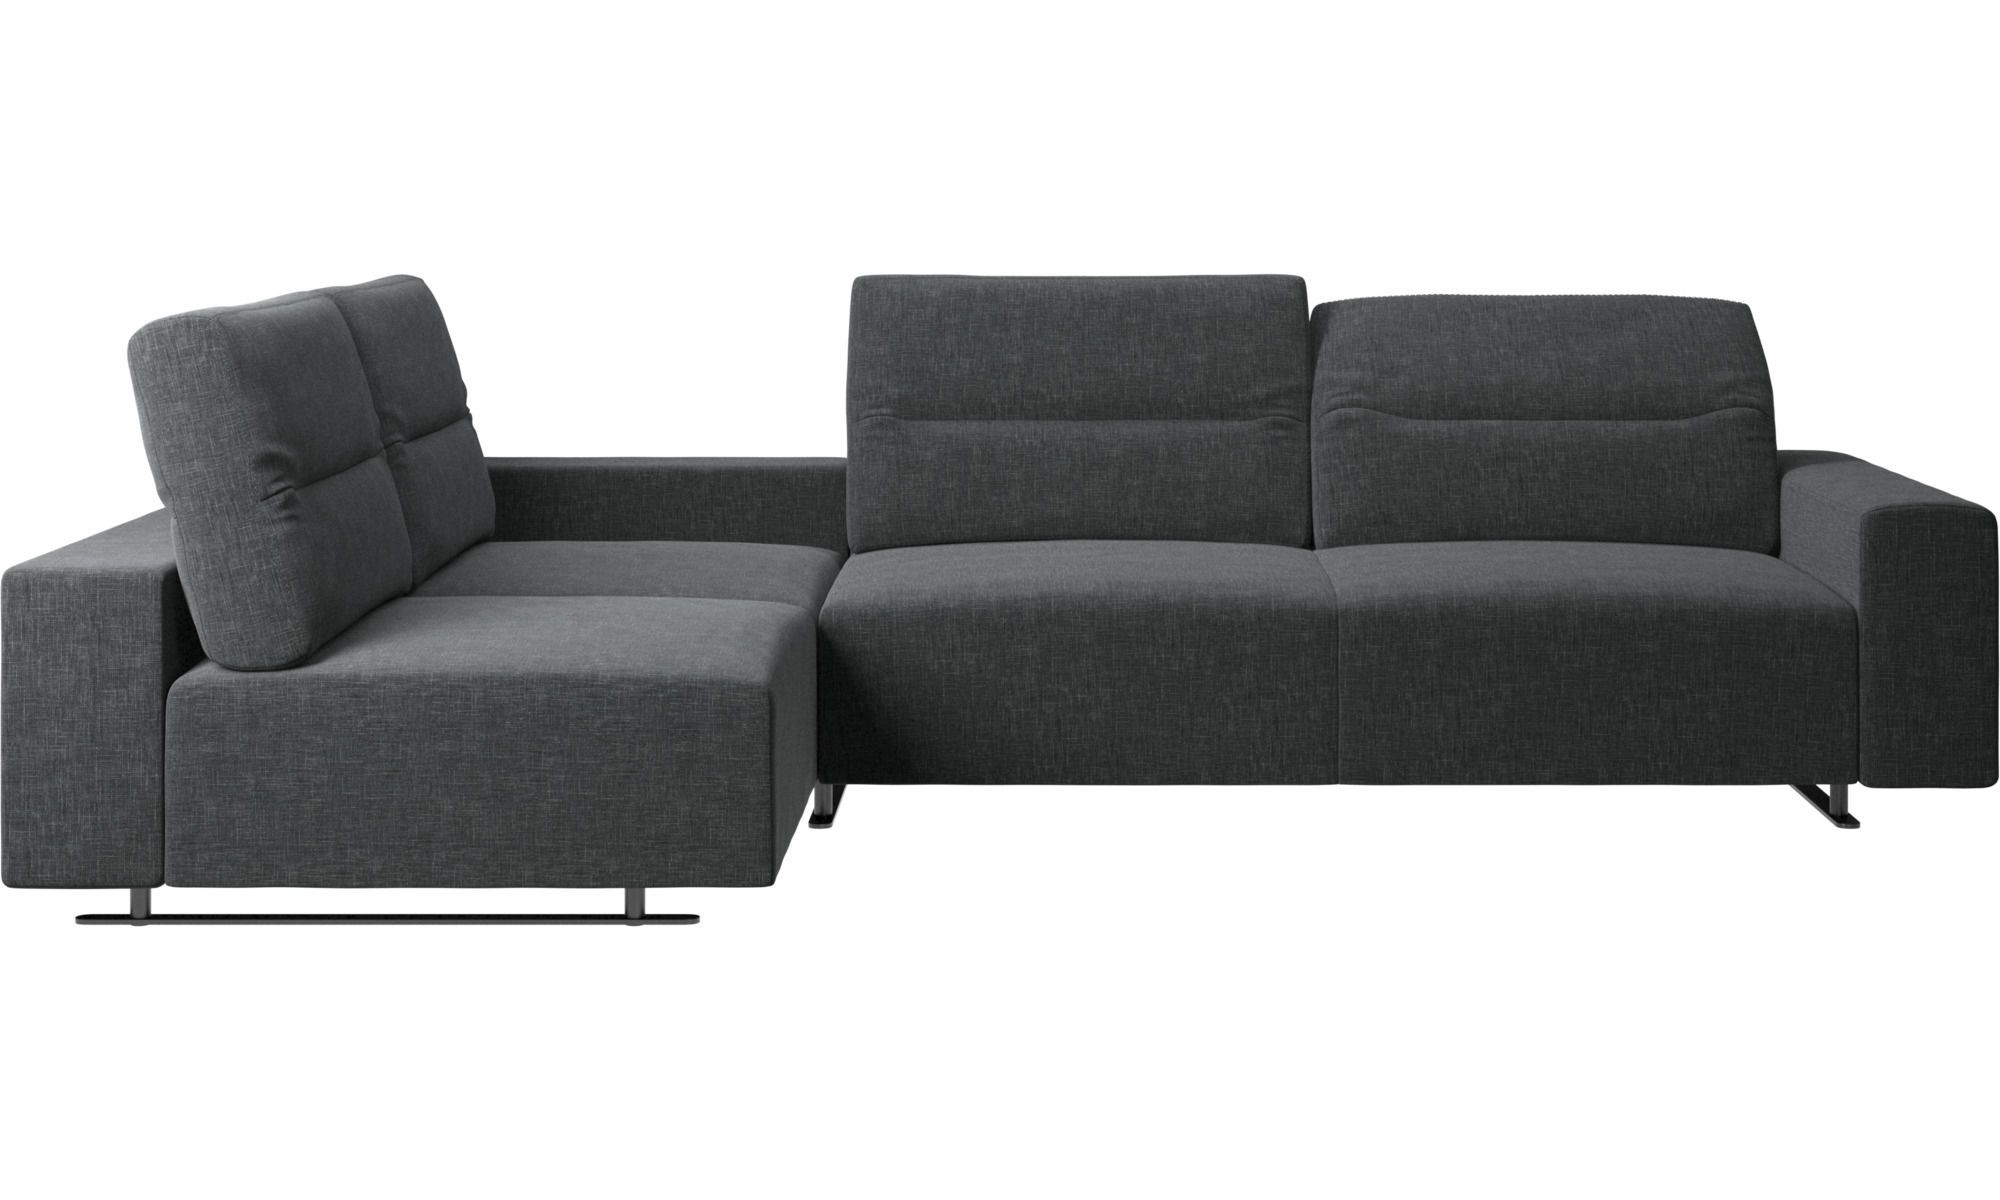 Hampton Corner Sofa With Adjustable Back And Storage On Right Side Corner Sofa Design Corner Sofa Leather Corner Sofa